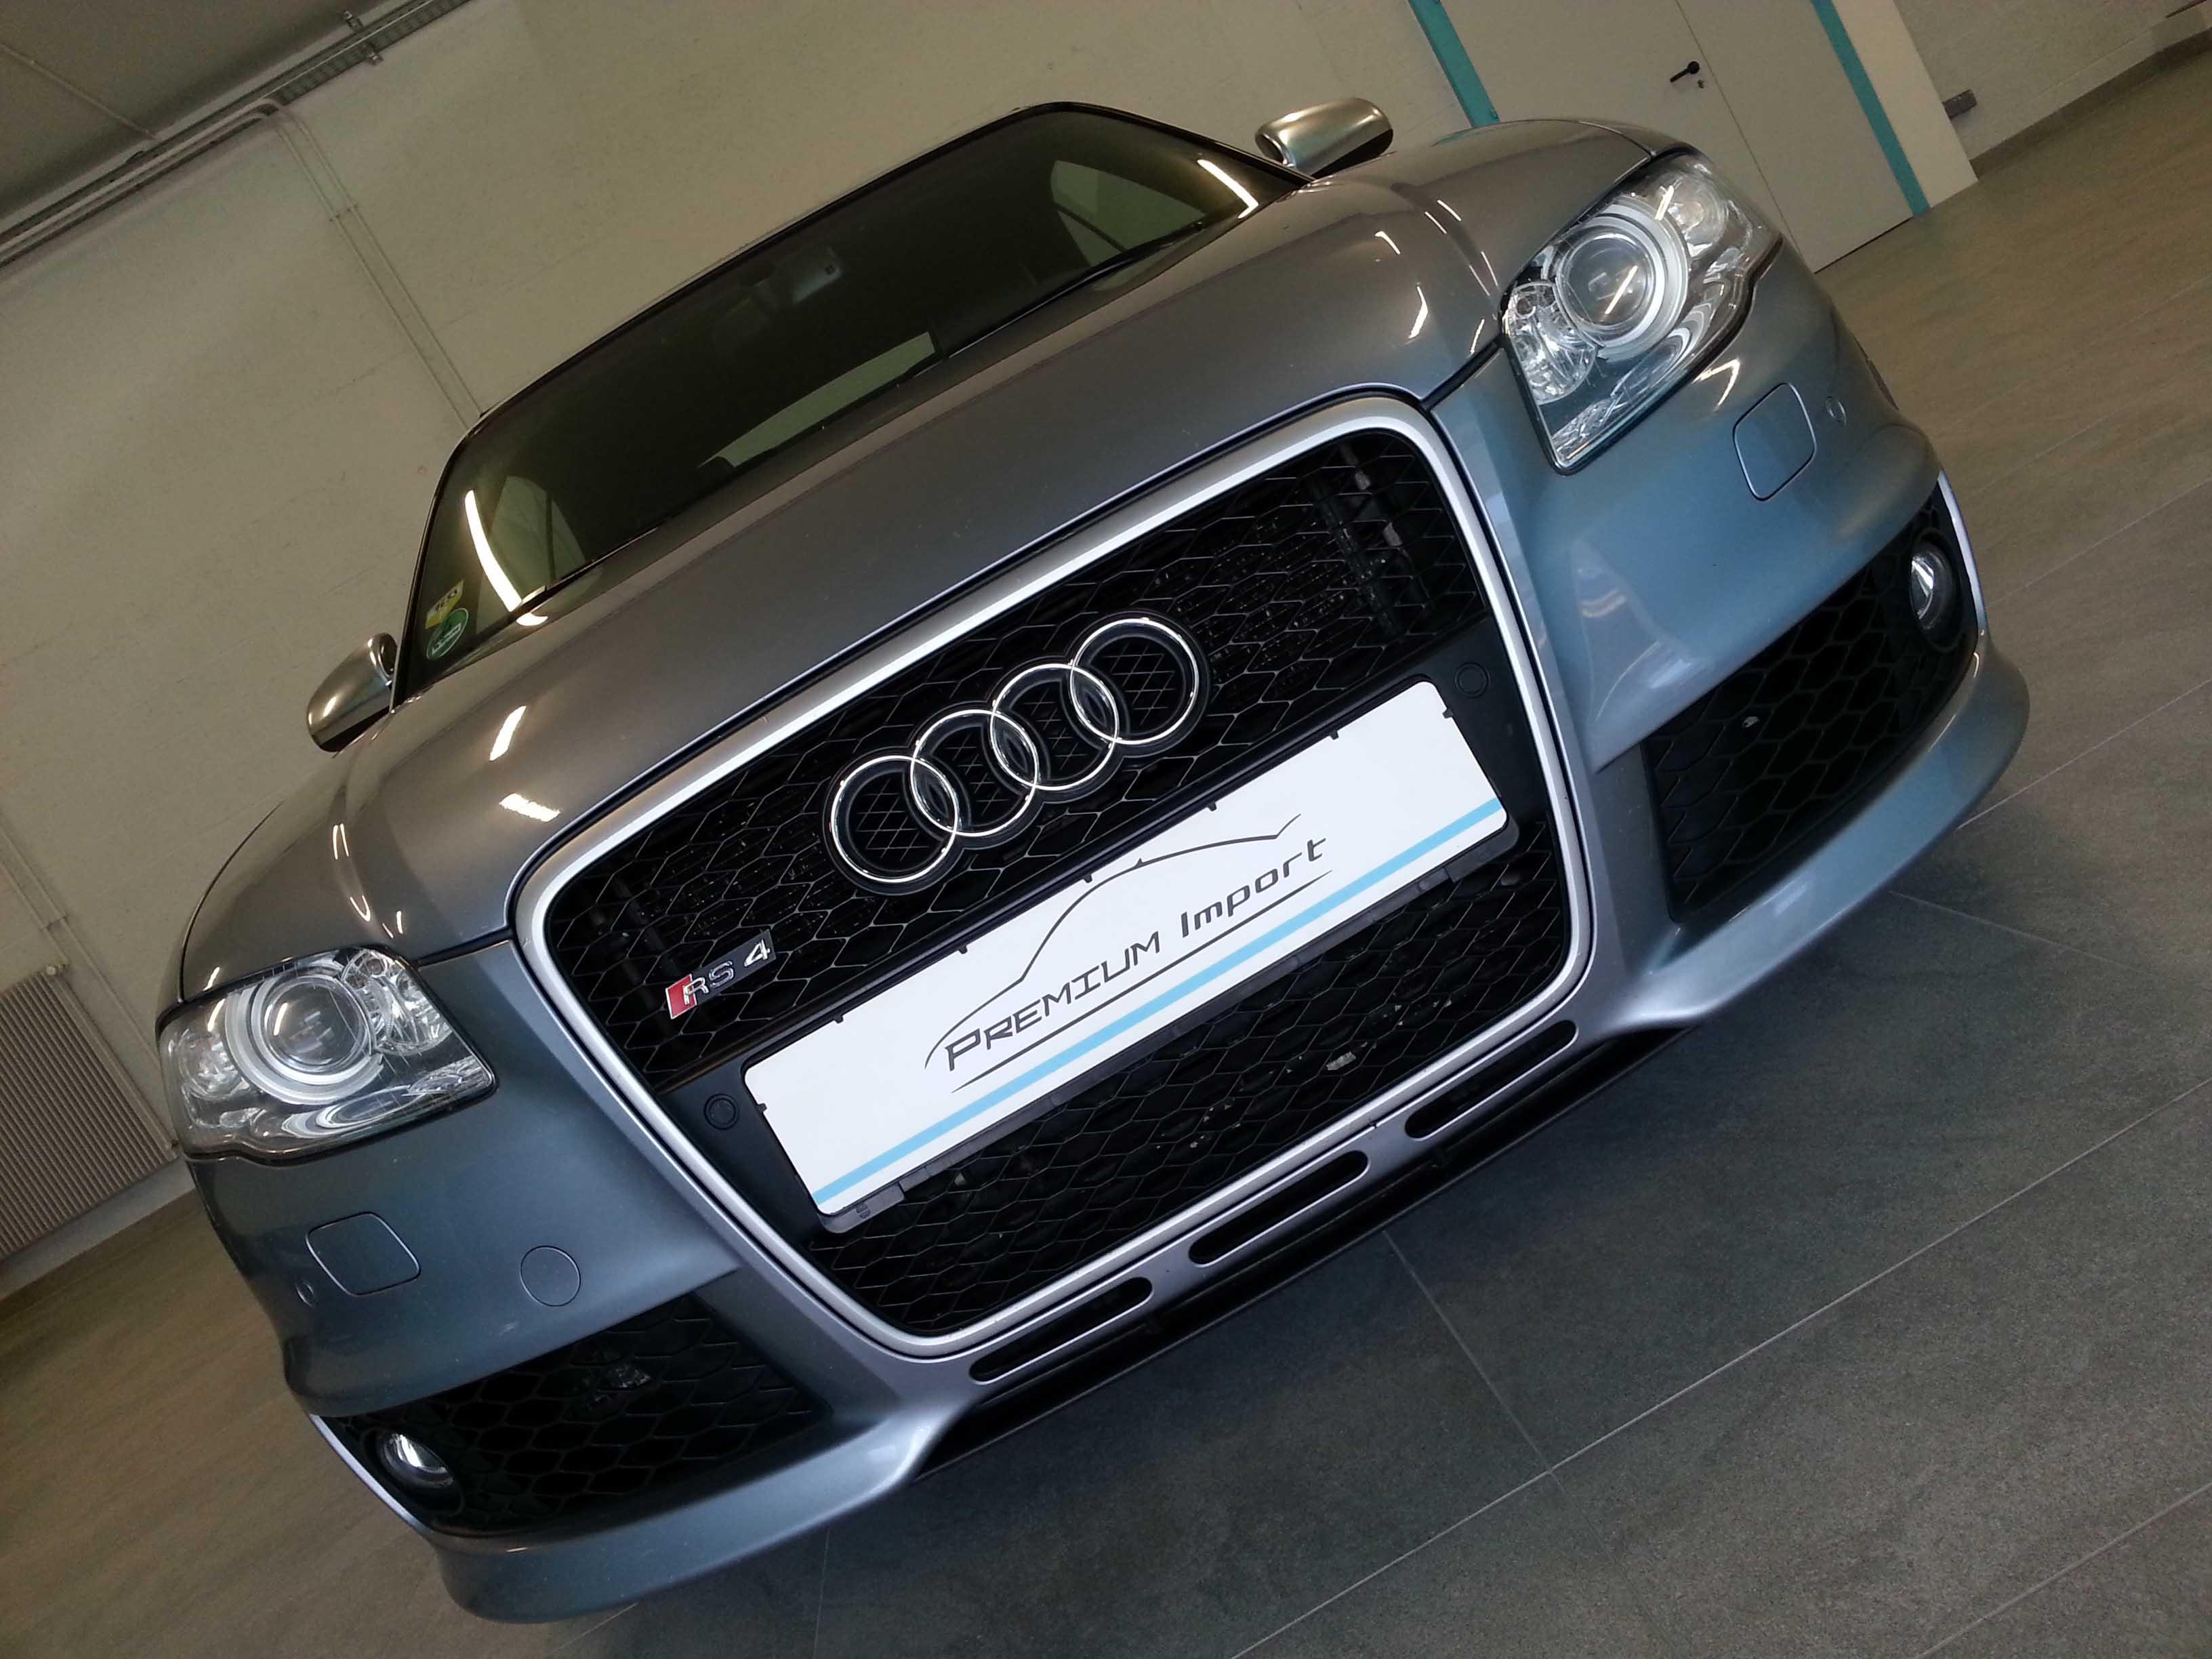 Audi RS4 Cabriolet 4.2 FSI